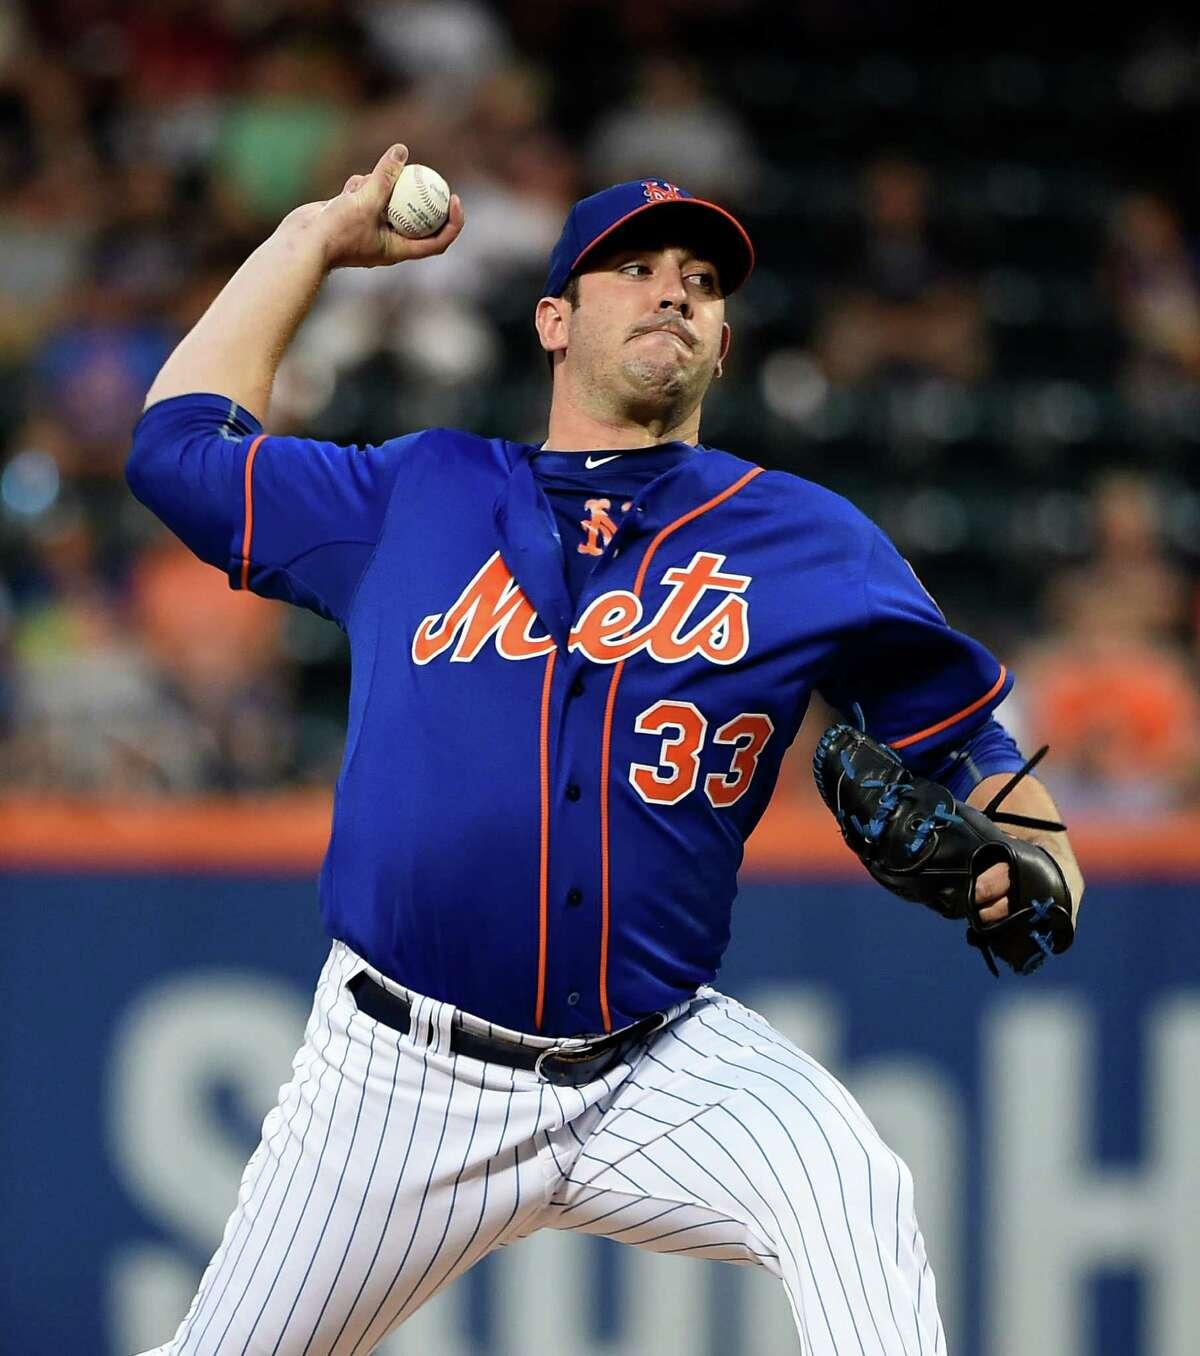 New York Mets starting pitcher Matt Harvey throws against the Philadelphia Phillies during the first inning of a baseball game Wednesday, Sept. 2, 2015, in New York. (AP Photo/Kathy Kmonicek) ORG XMIT: NYM104